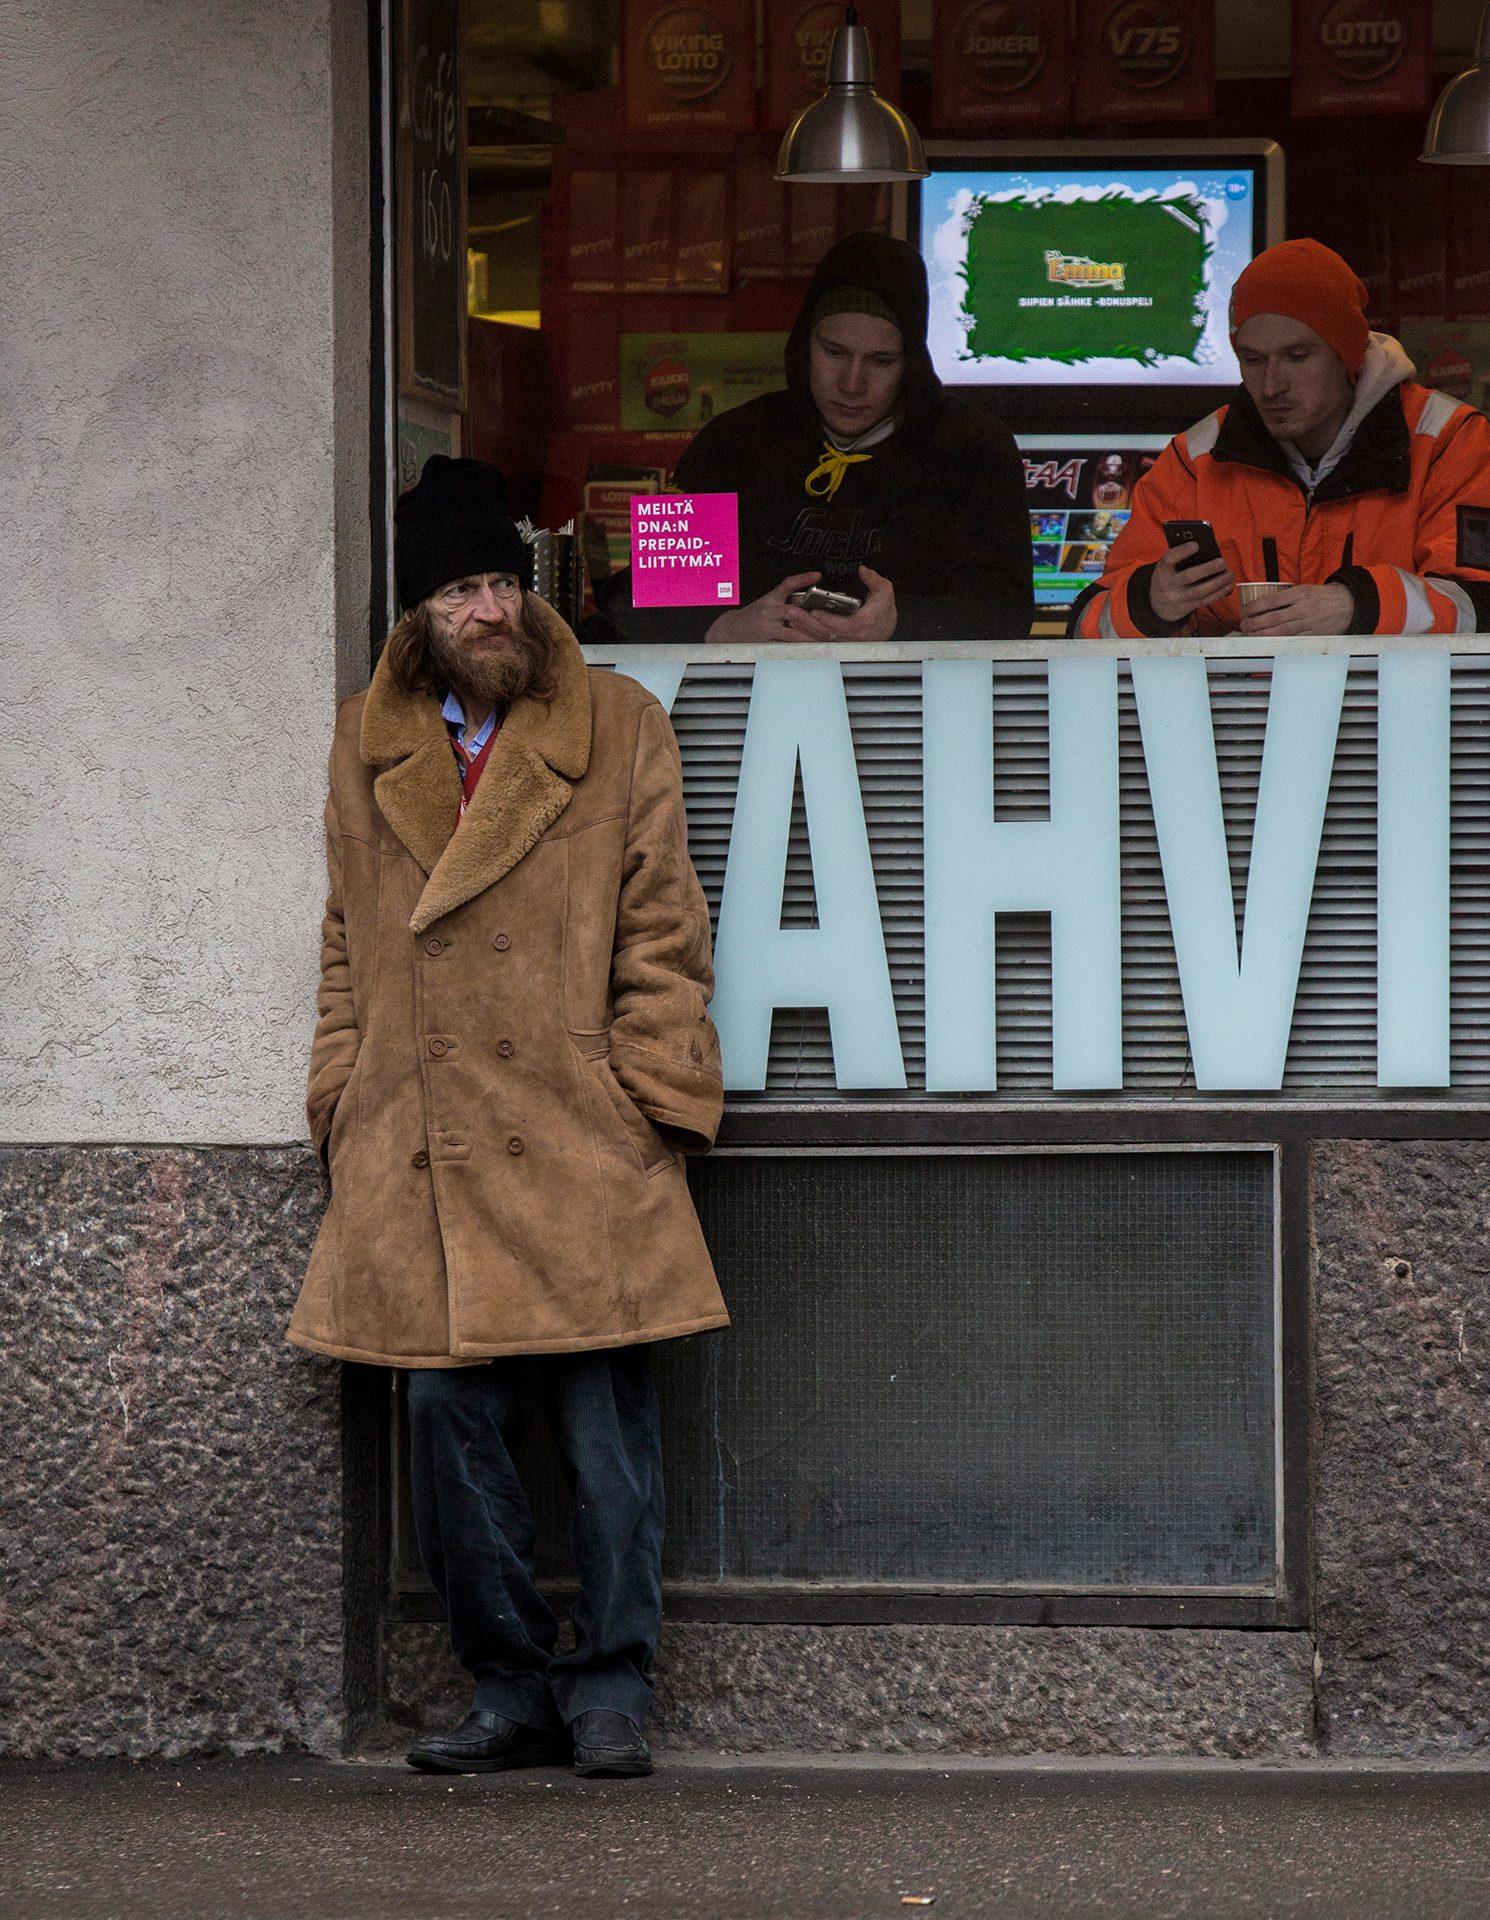 Kahvi, Helsinki, Finland, beggar, vagabond, cold, lonely, hard life, live, man, hungry, poor